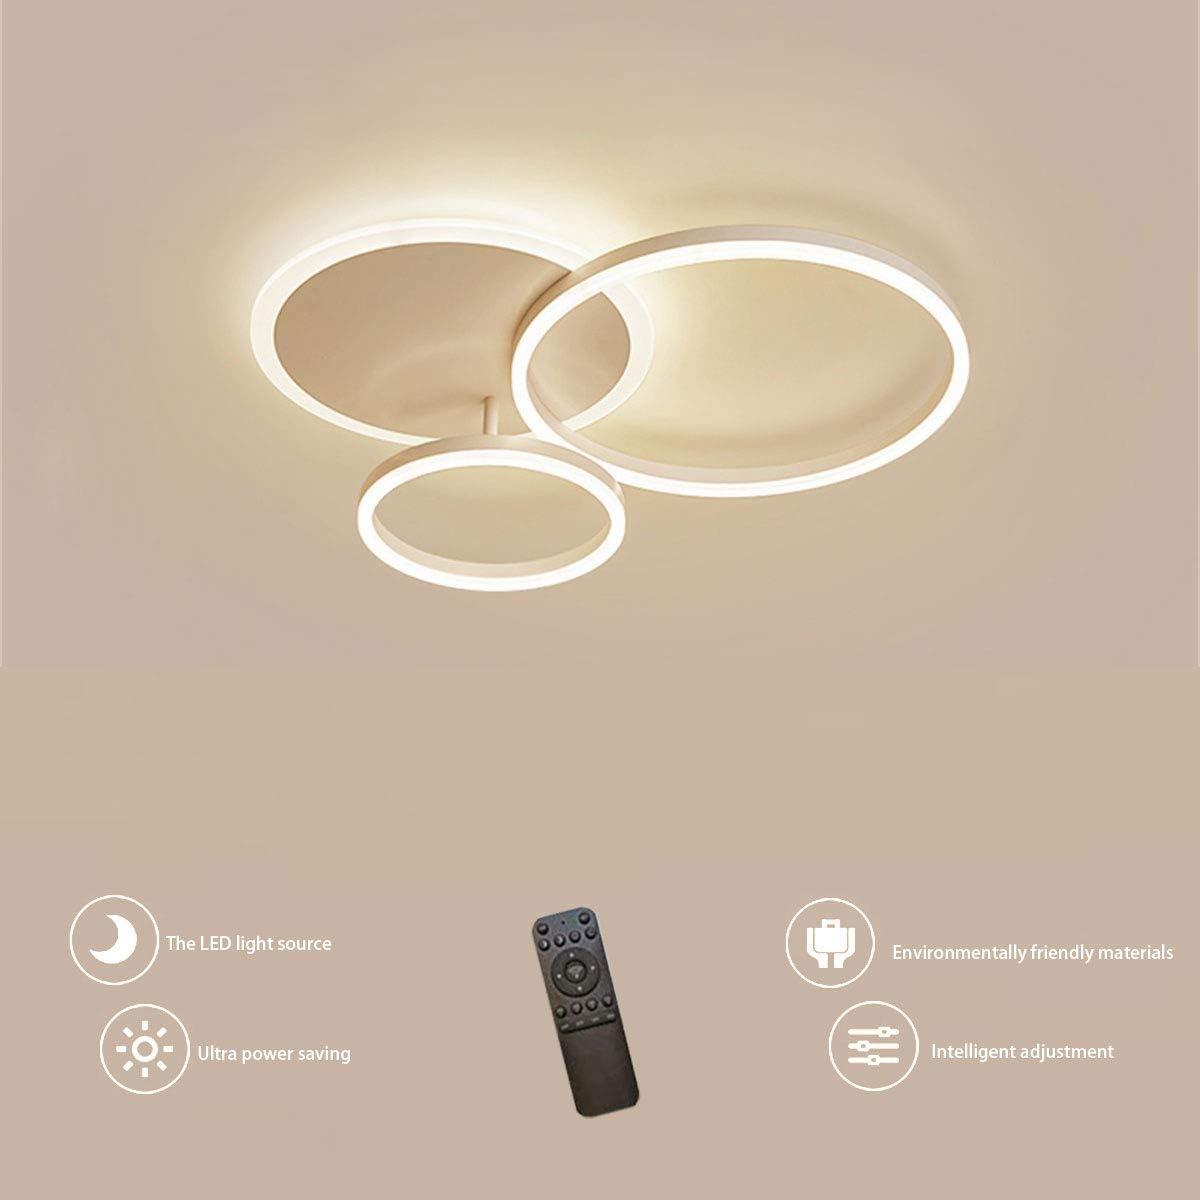 LED Deckenleuchte NINEZ Ring Design Decken Lampe Minimalistisch Fernbedienung Dimmbar Aluminium Acryl Beleuchtung Kinderzimmer Lampe Esszimmerlampe Schlafzimmerlampe Badezimmerlampe Flurlampe